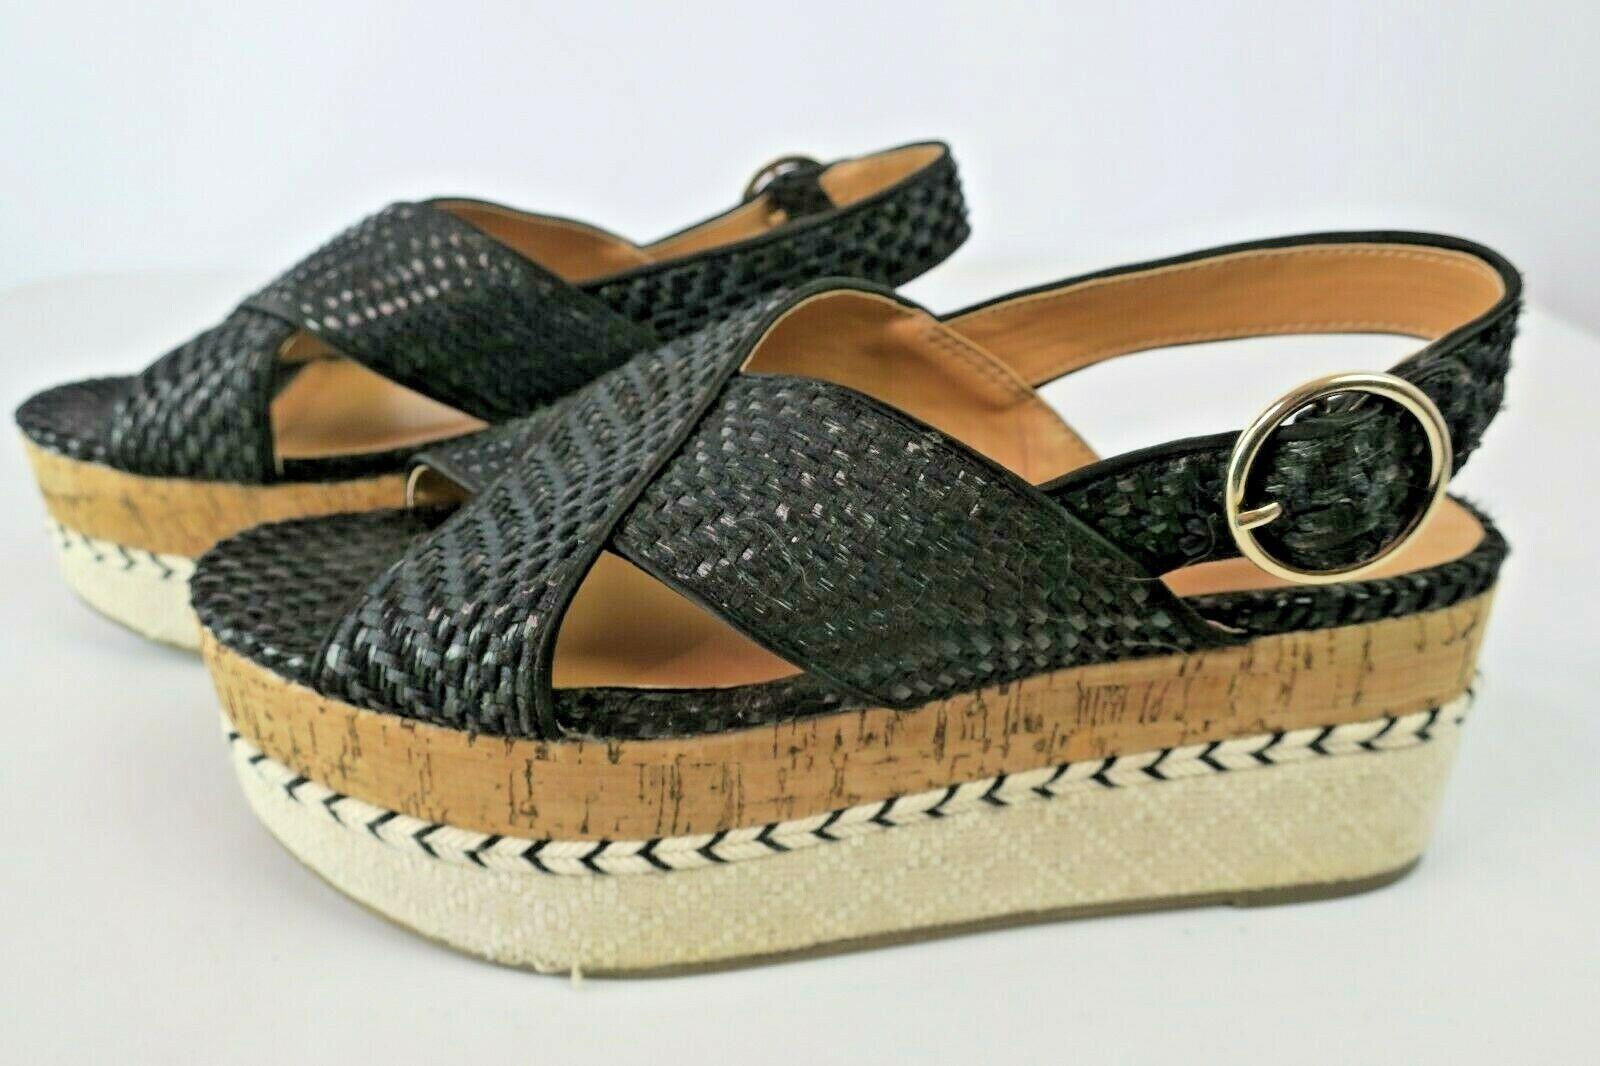 Zara Trafaluc Black Woven Cork Contrast Wedge Platform Sandals Right 39 Left 38